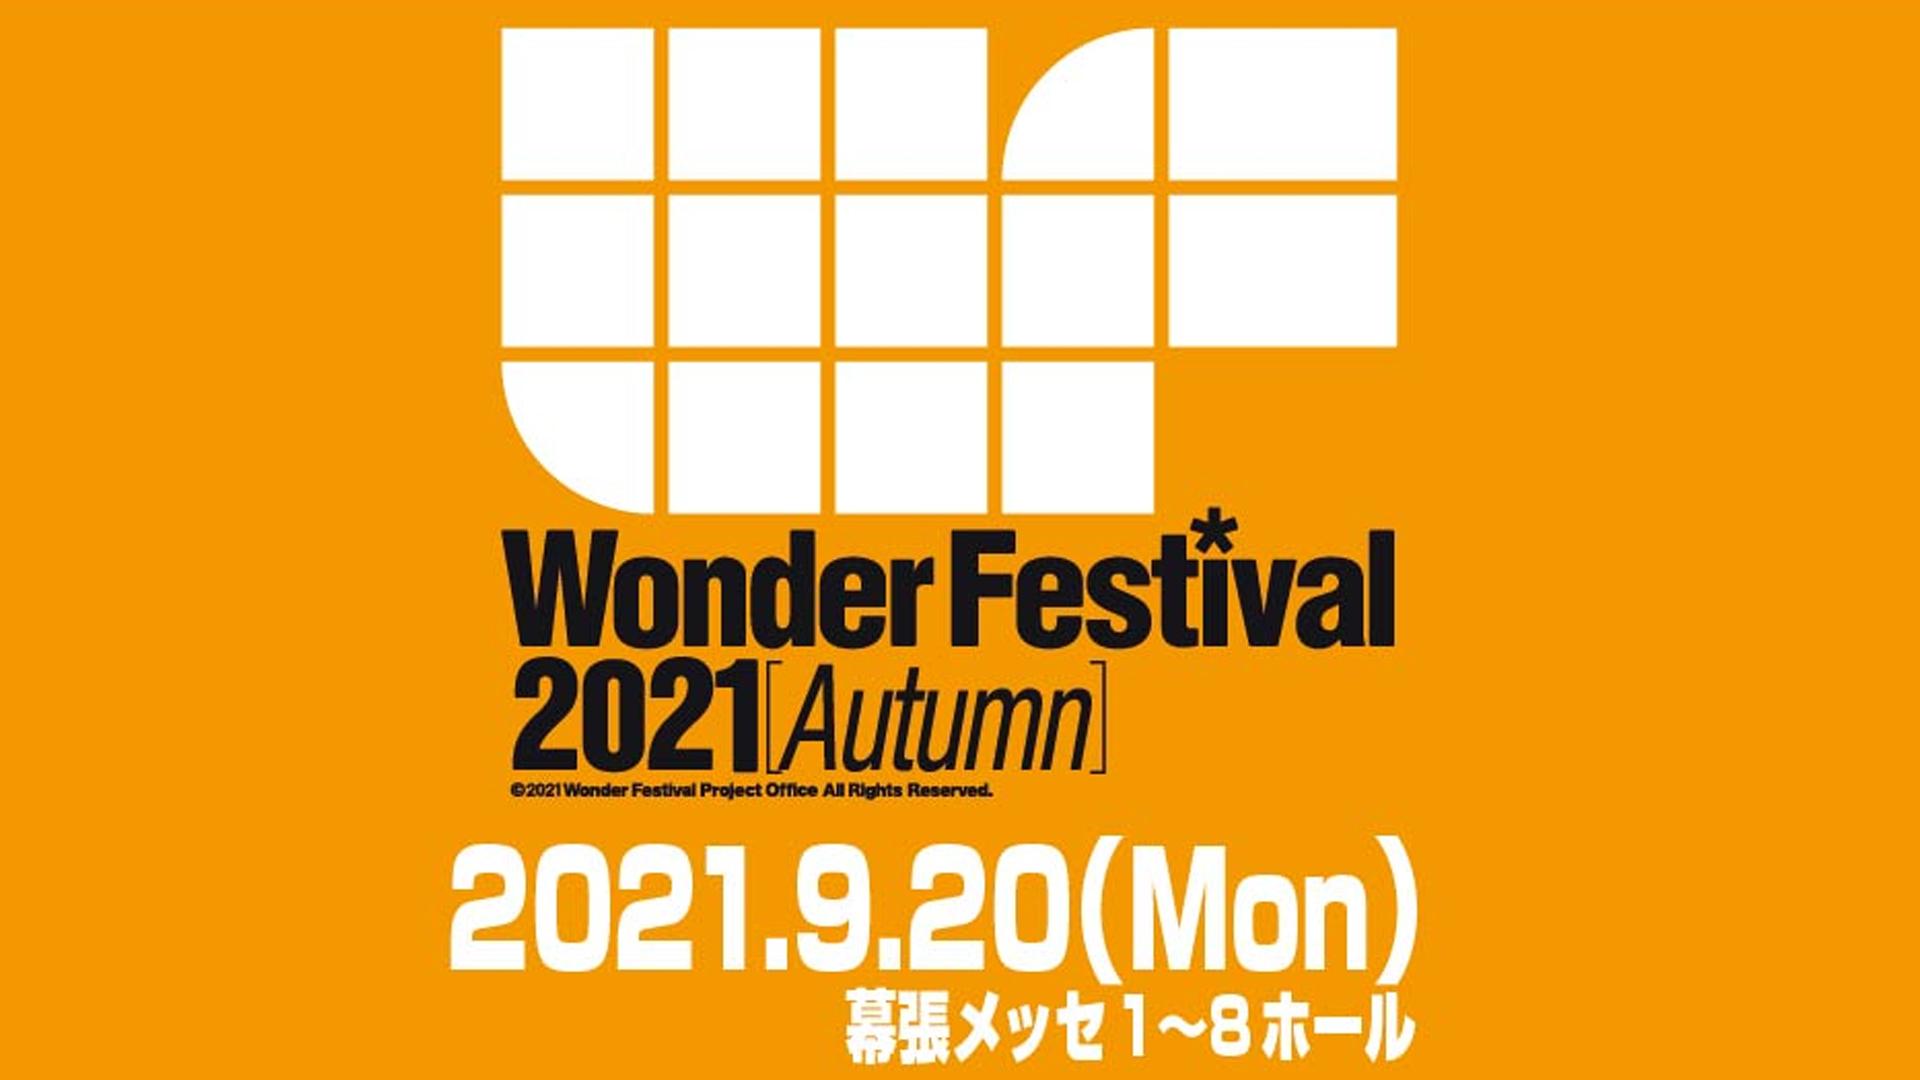 Logotipo de Wonder Festival 2021 Autumn